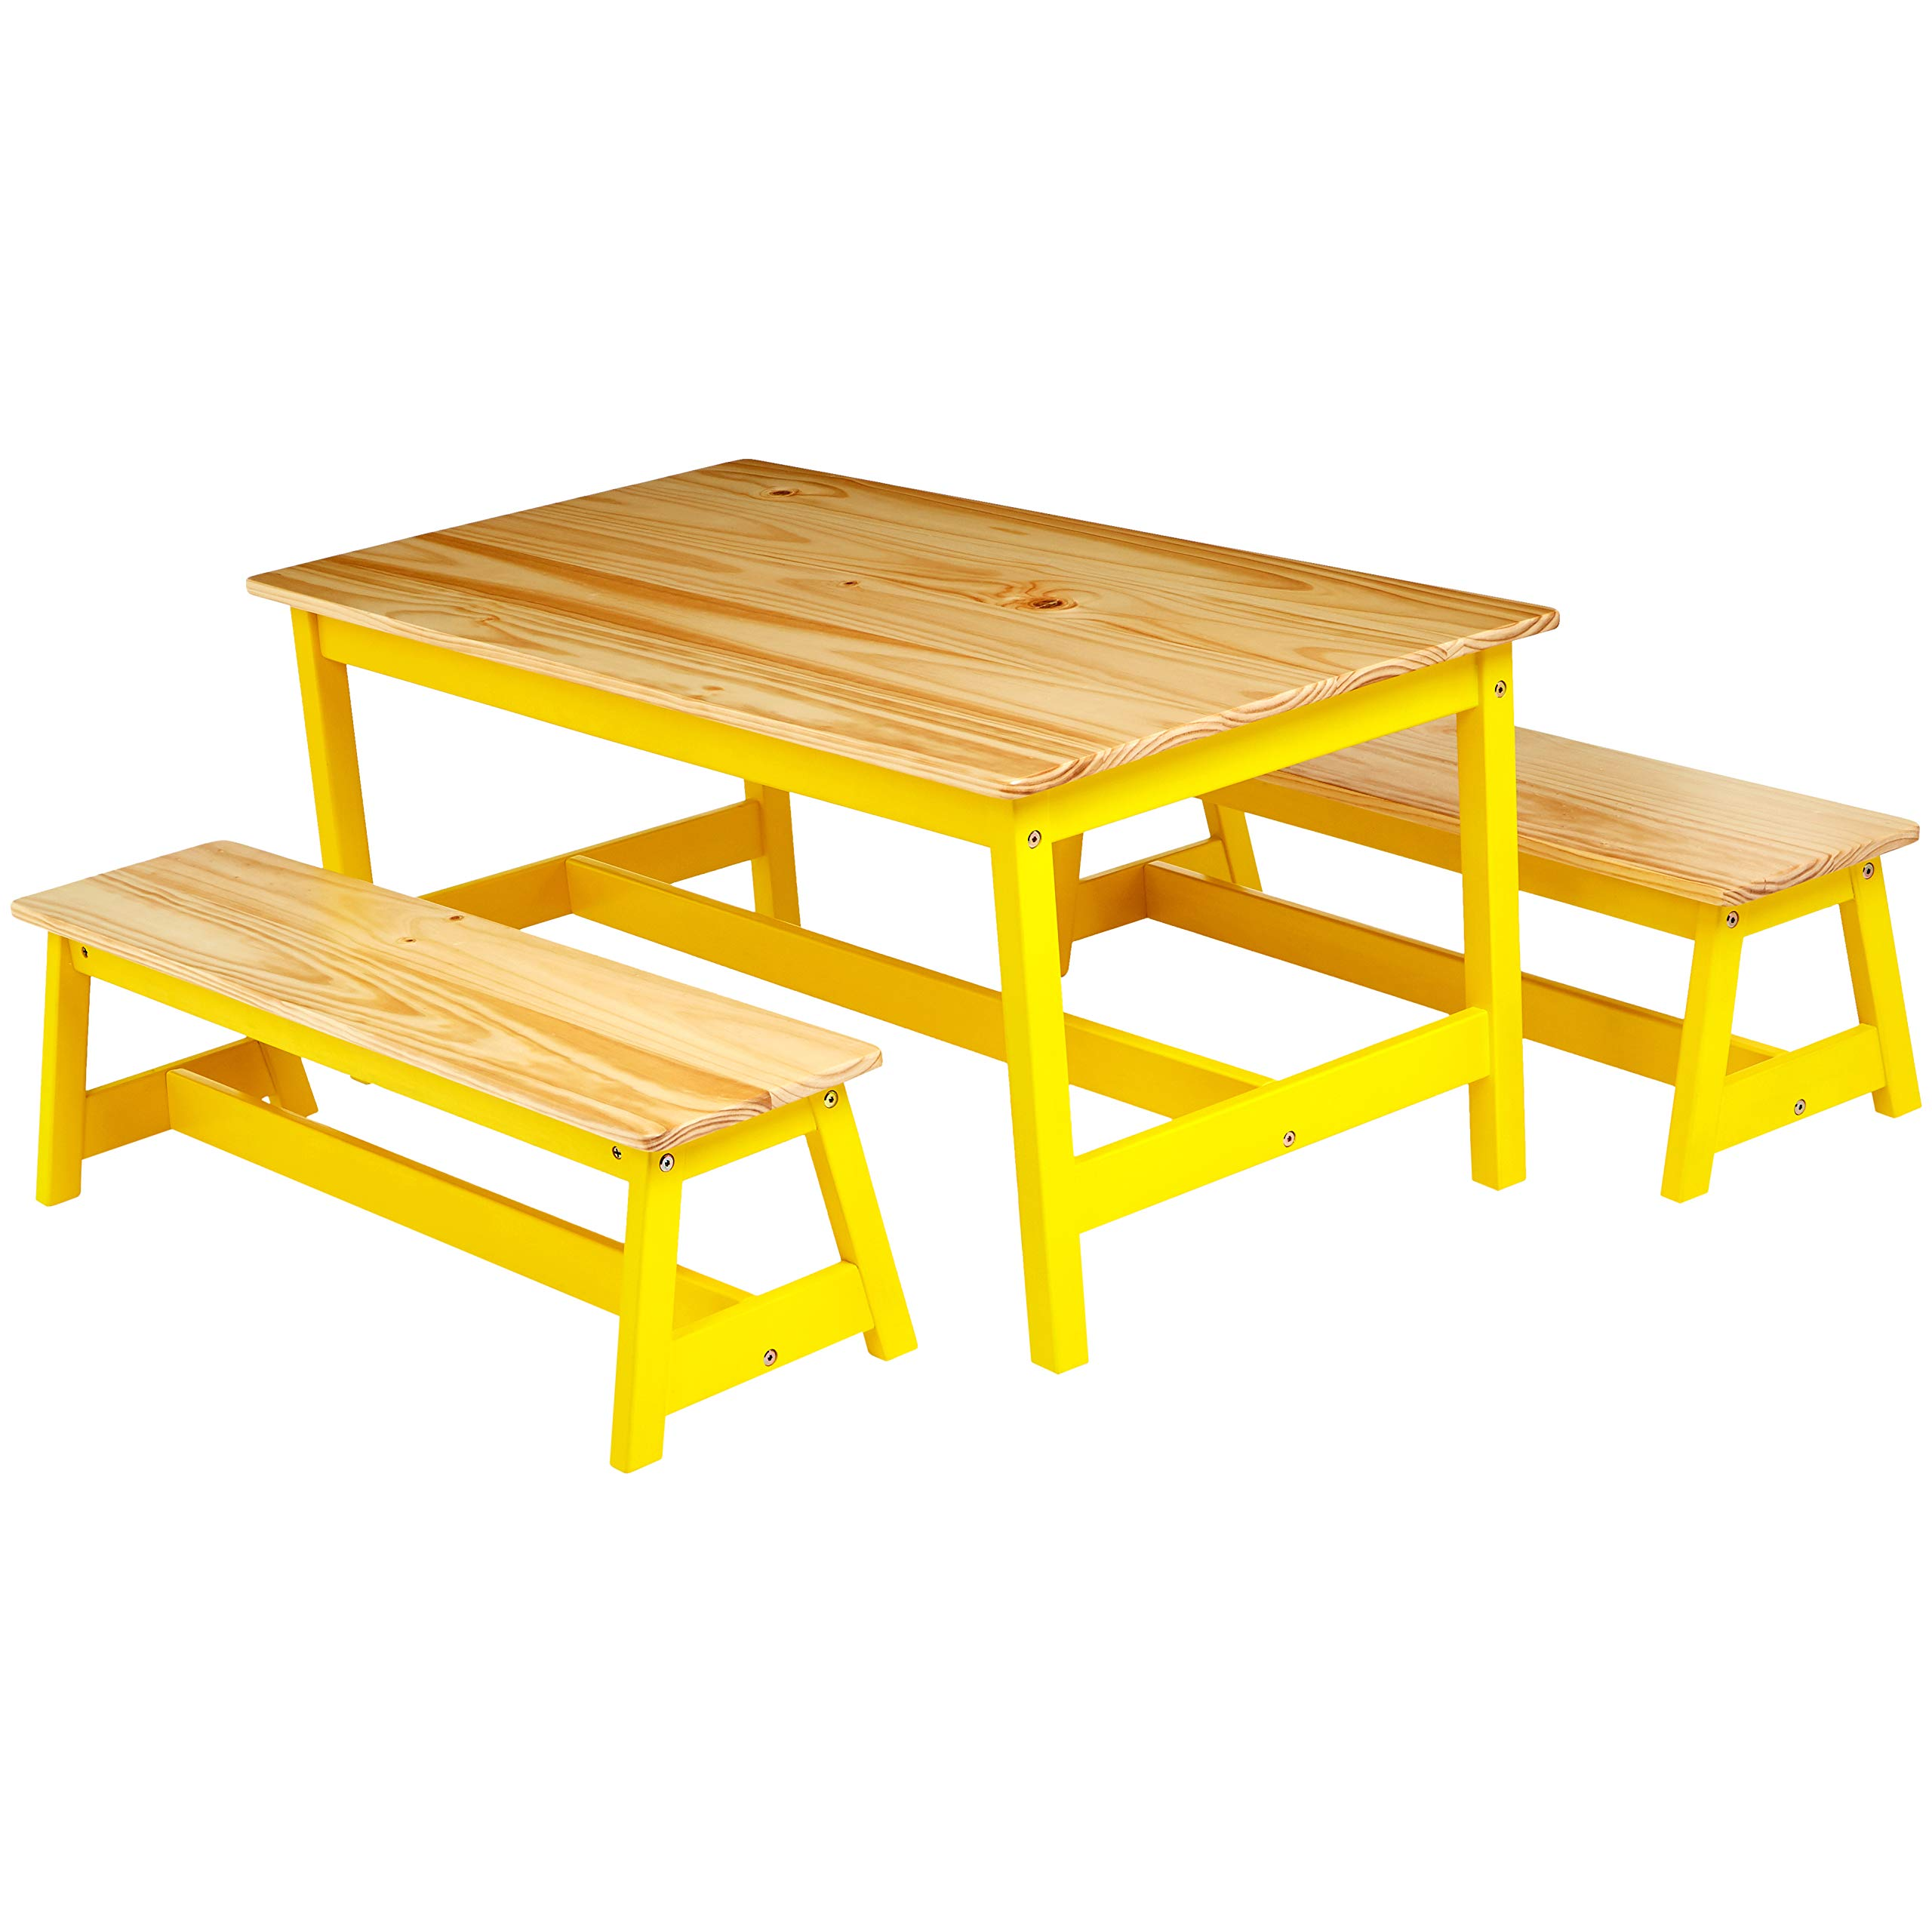 AmazonBasics Indoor Kids Table and Bench Set, Natural by AmazonBasics